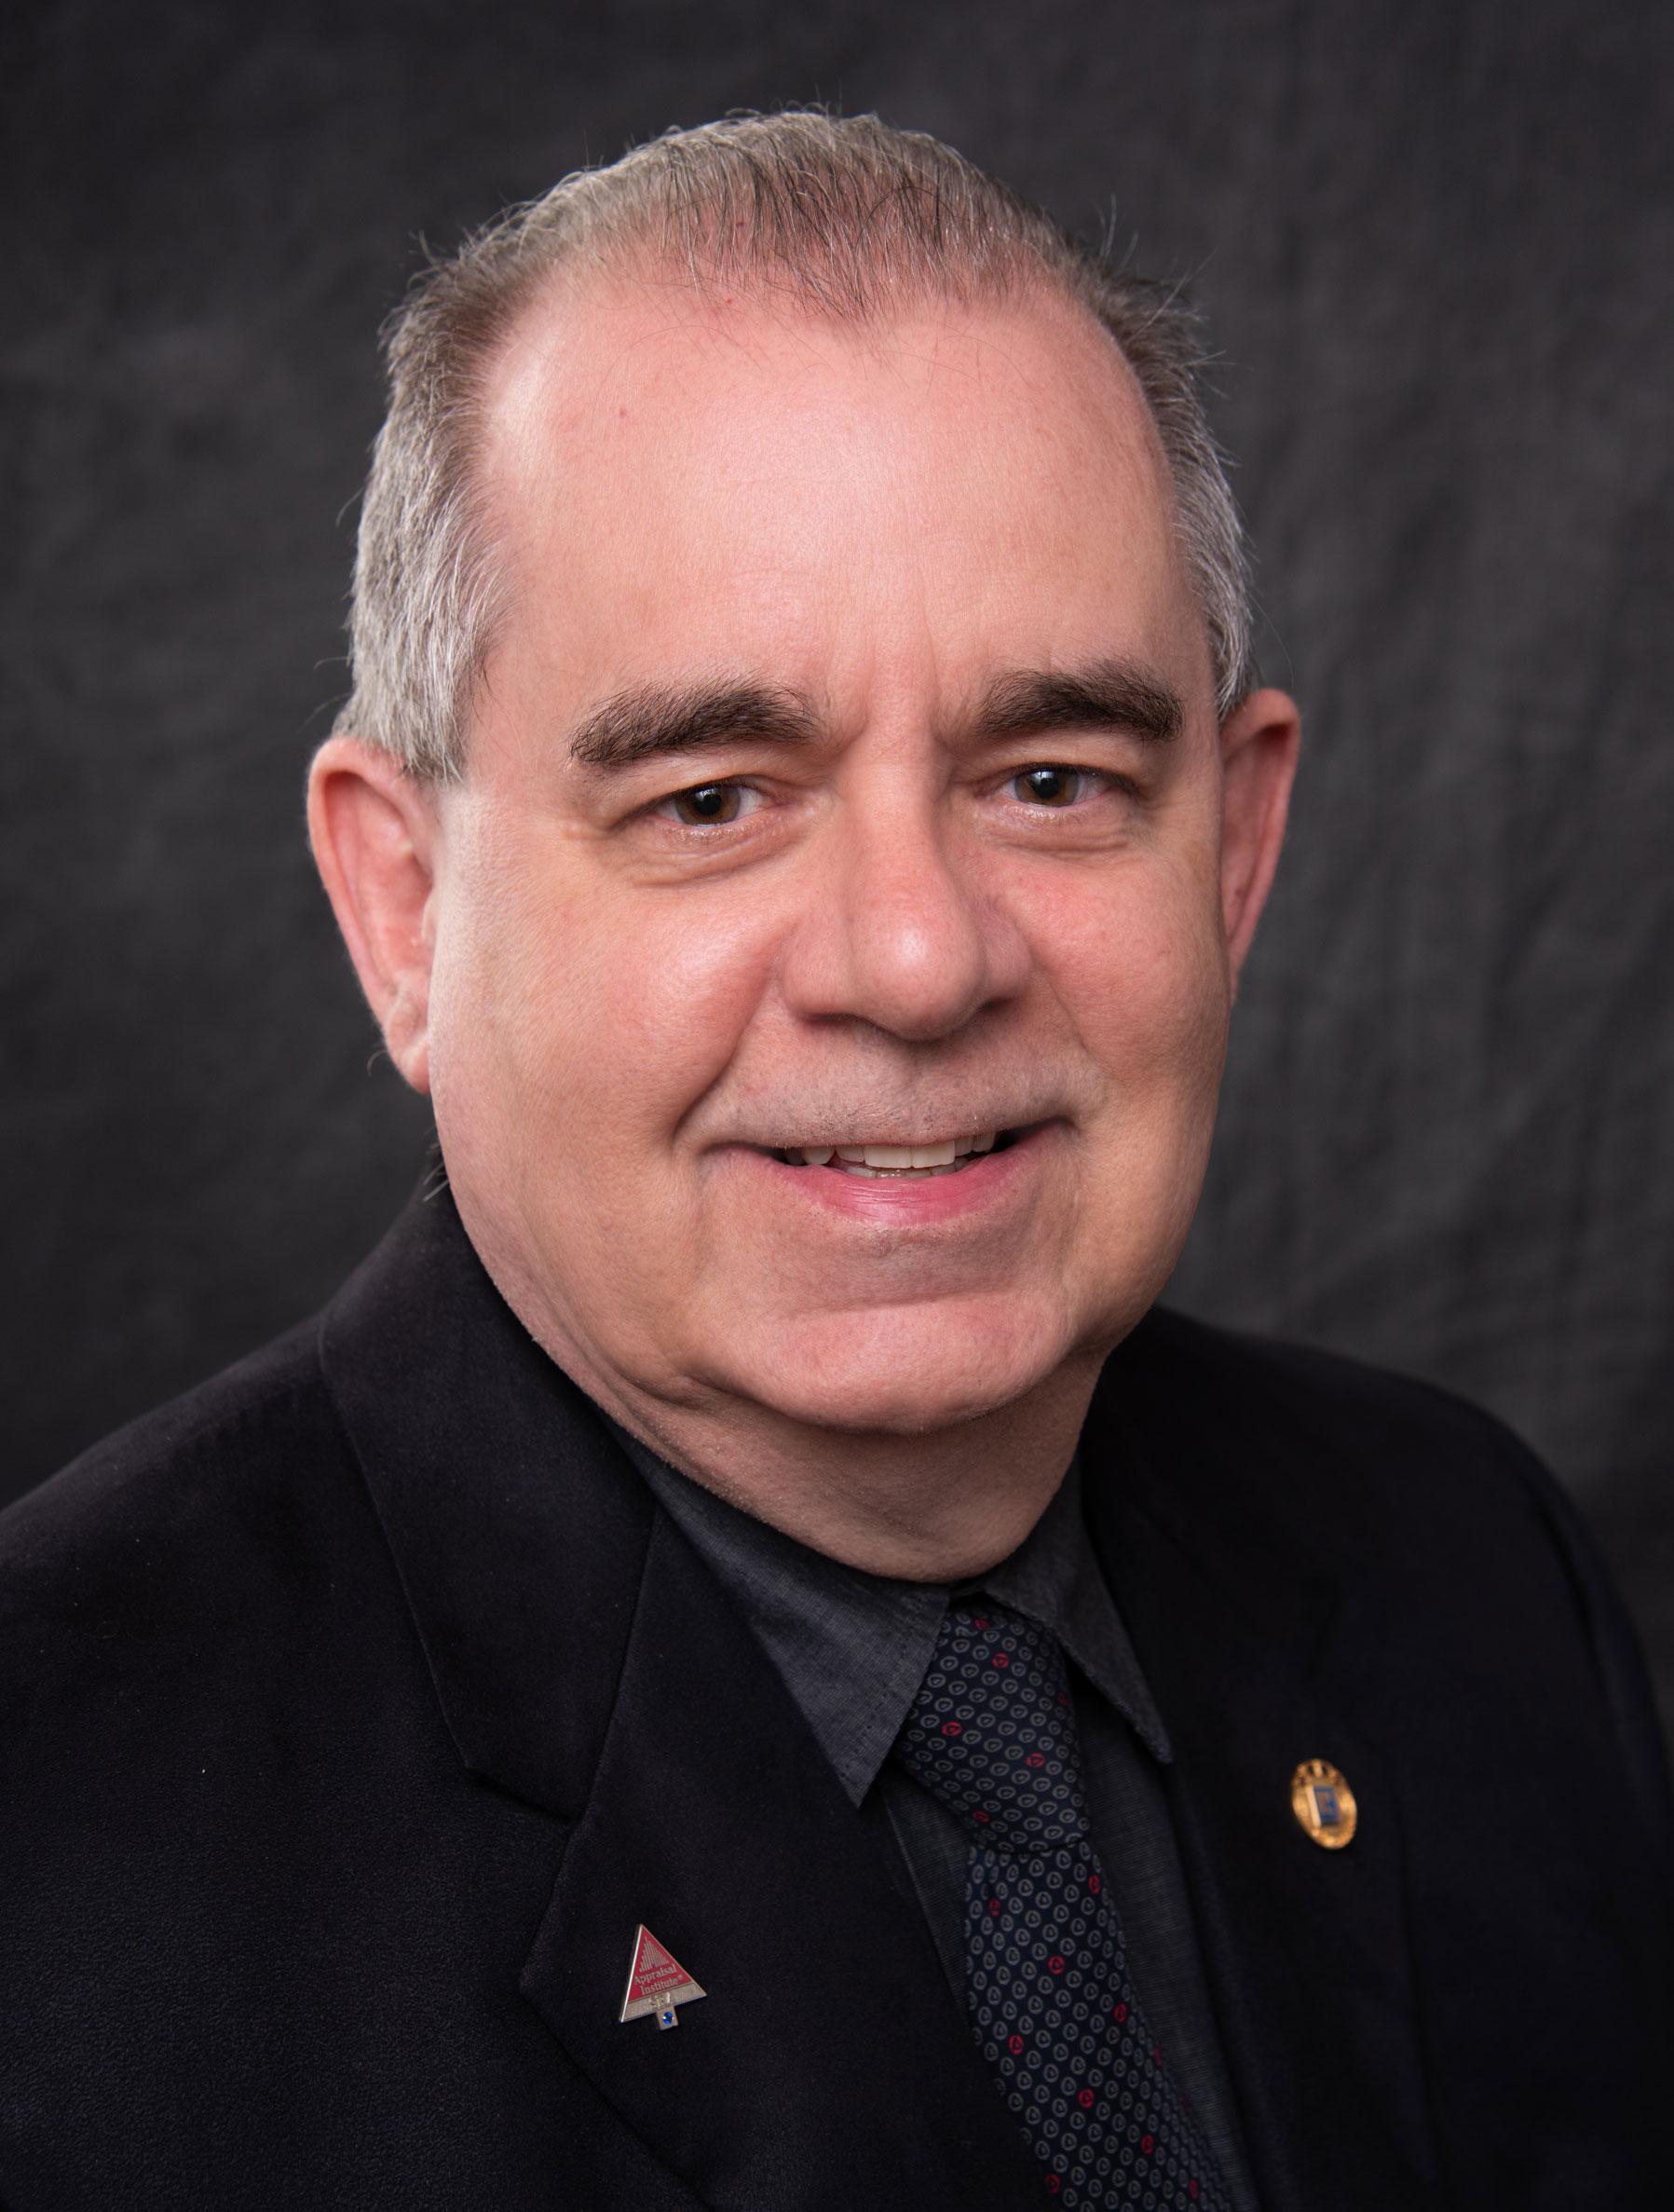 Bob Premecz, SRA